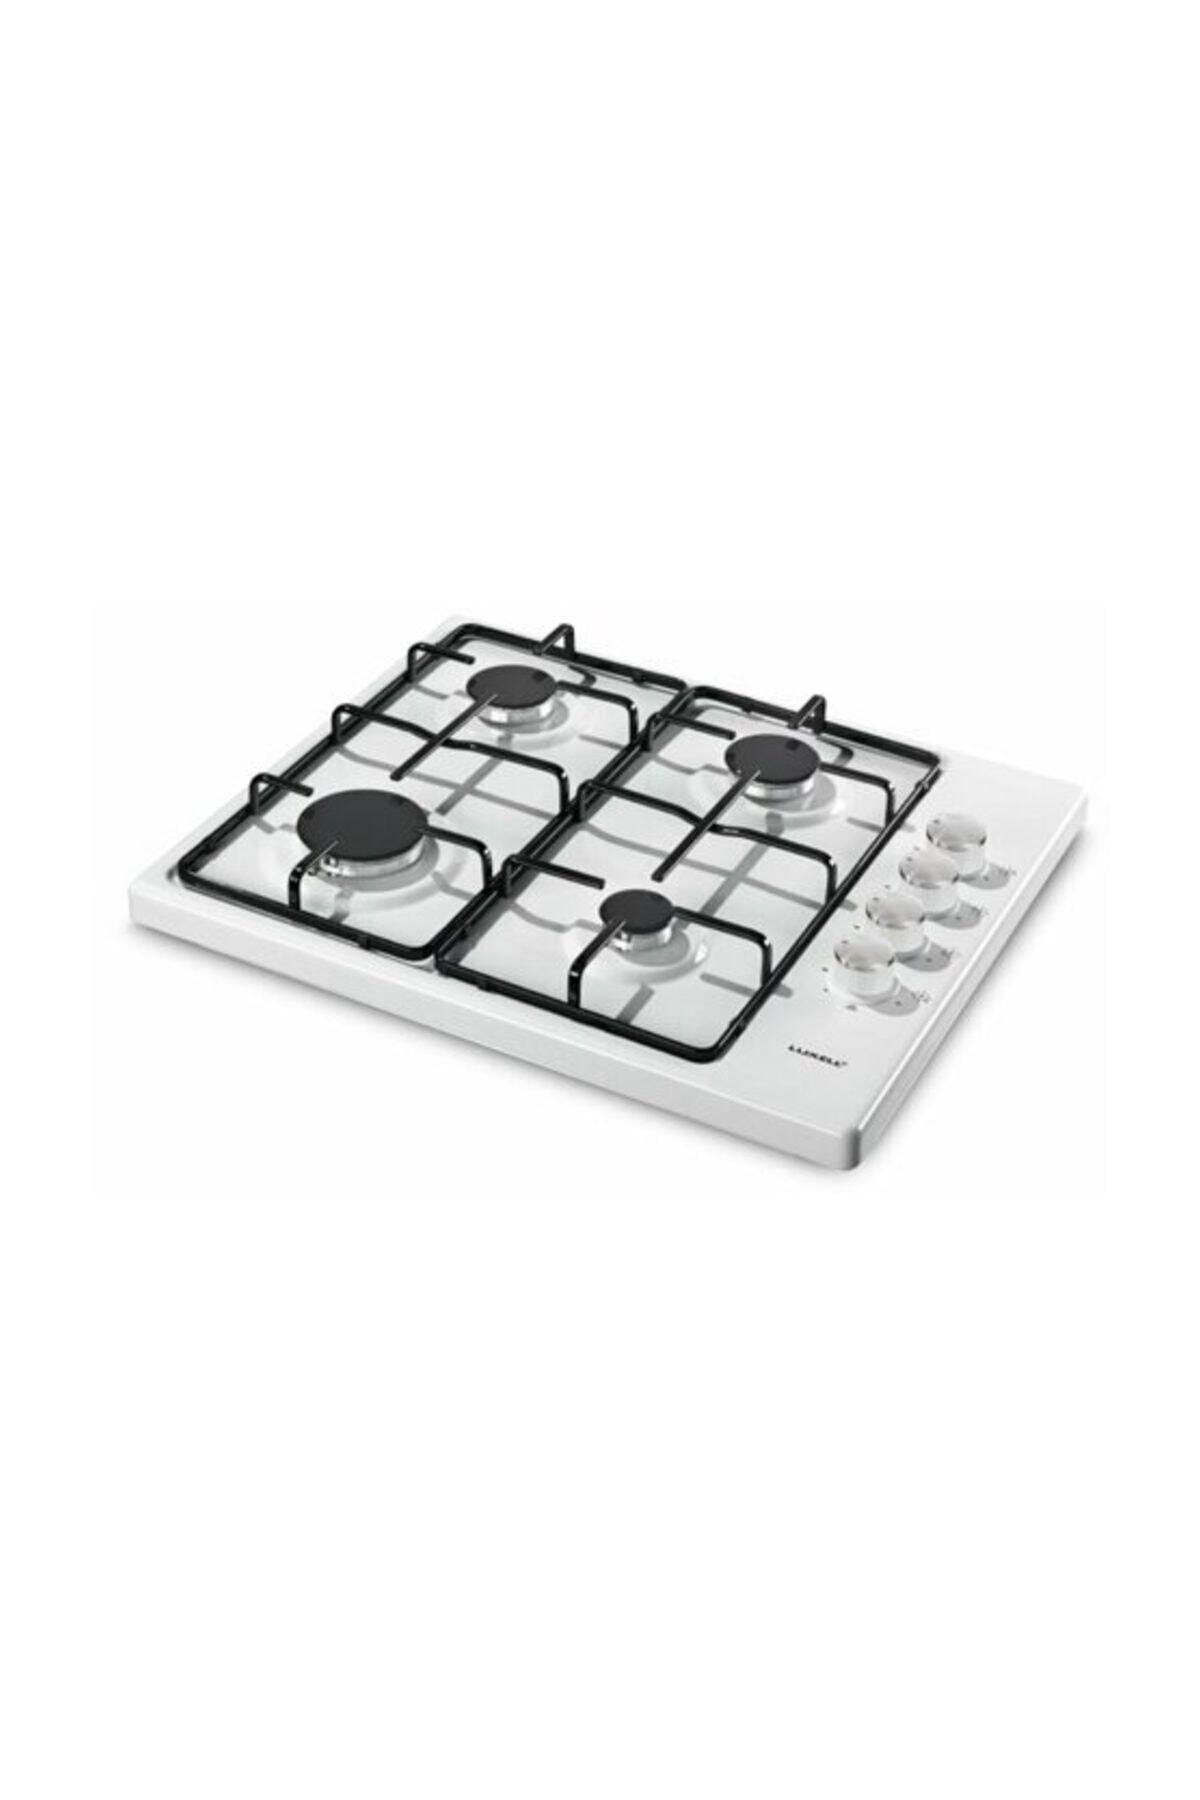 Luxell Gazlı Set Üstü Beyaz Ocak Lx-420 F Lpg 1